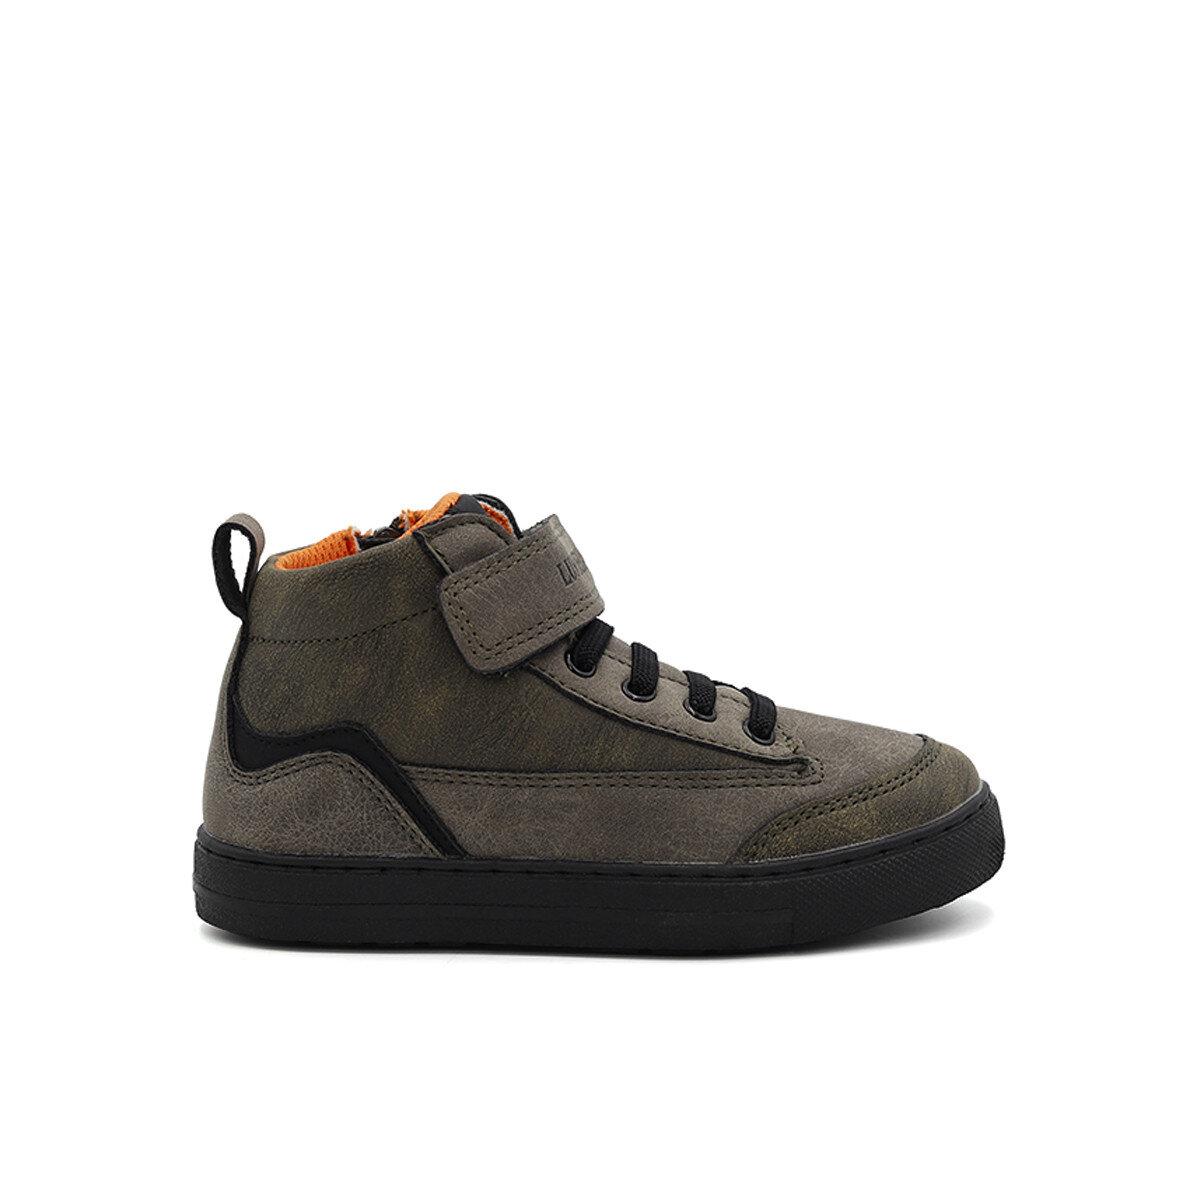 KING Sneakers Bambino